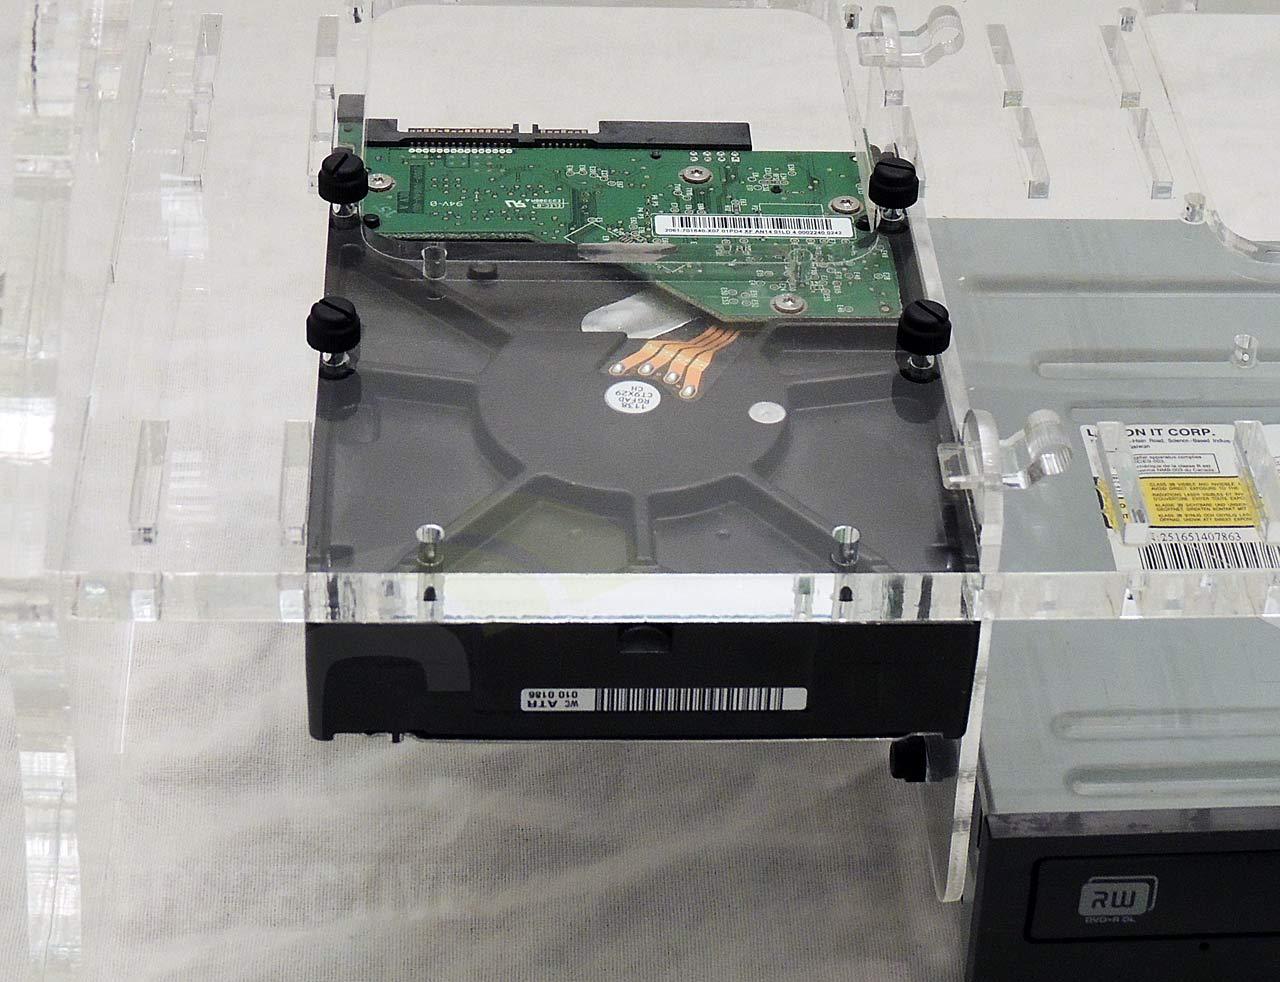 13-case-hd-mount-mid-tray-top-down.jpg